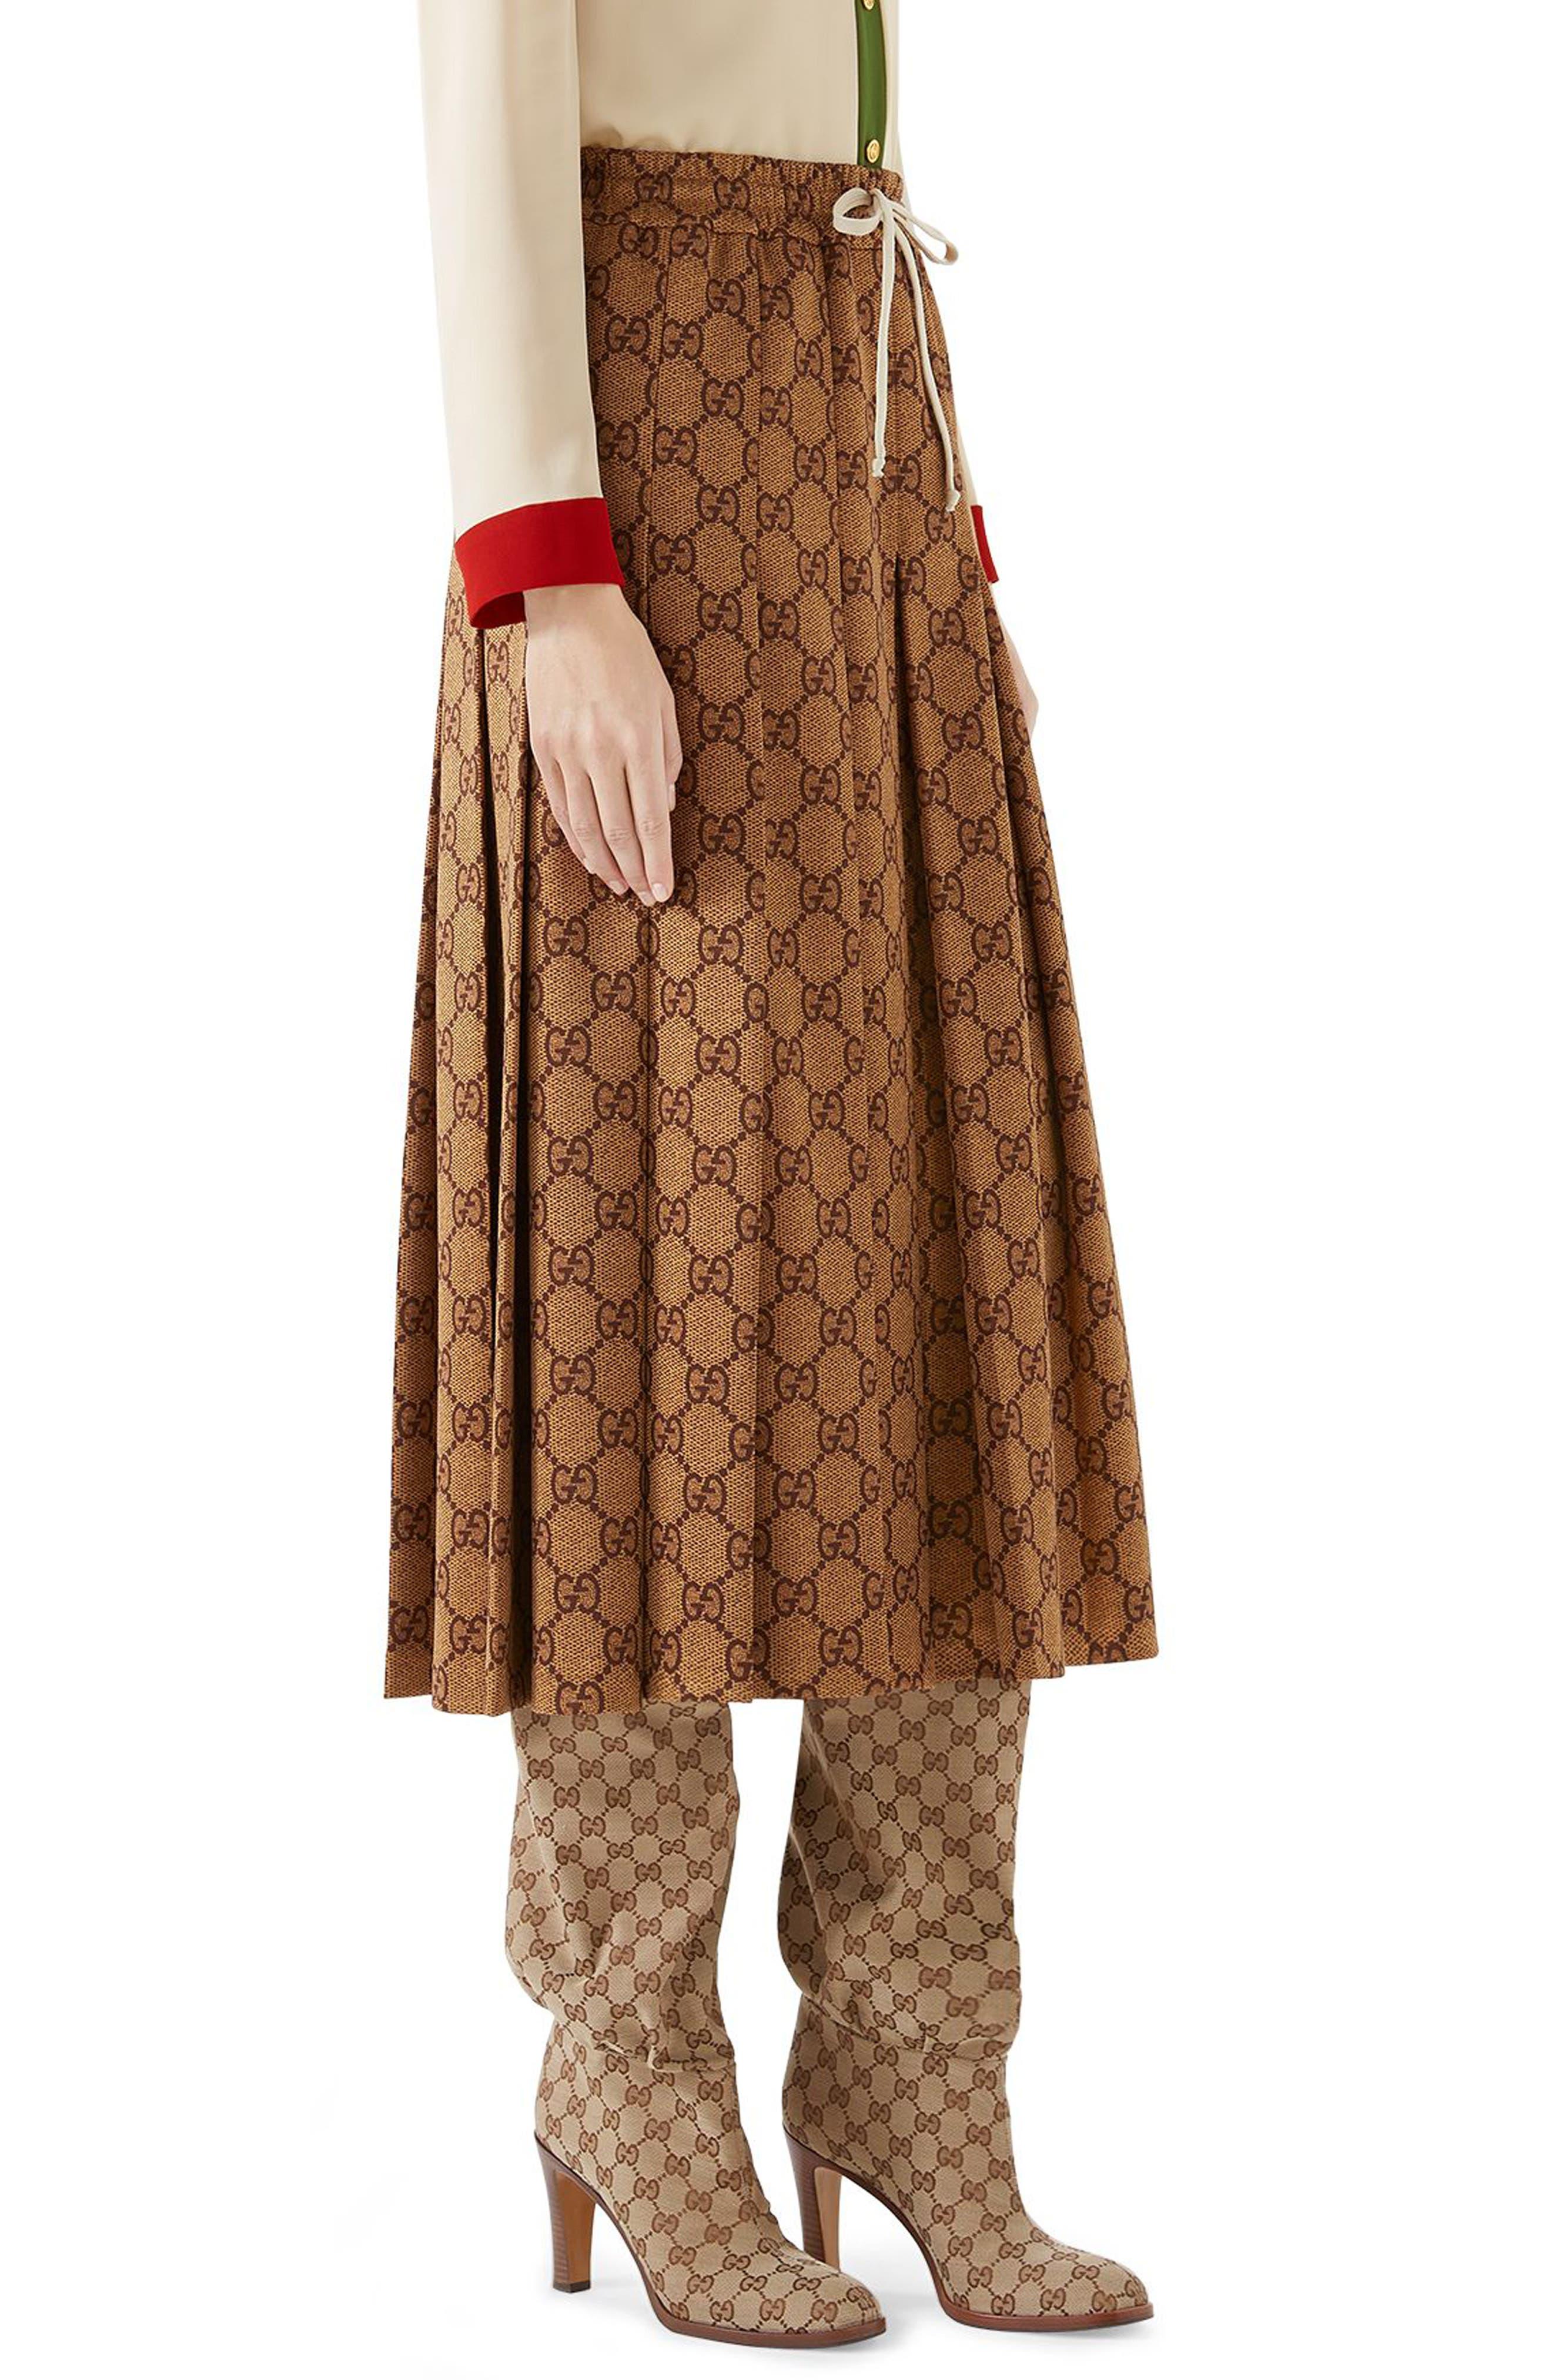 GG Print Pleated Midi Skirt,                             Alternate thumbnail 3, color,                             200